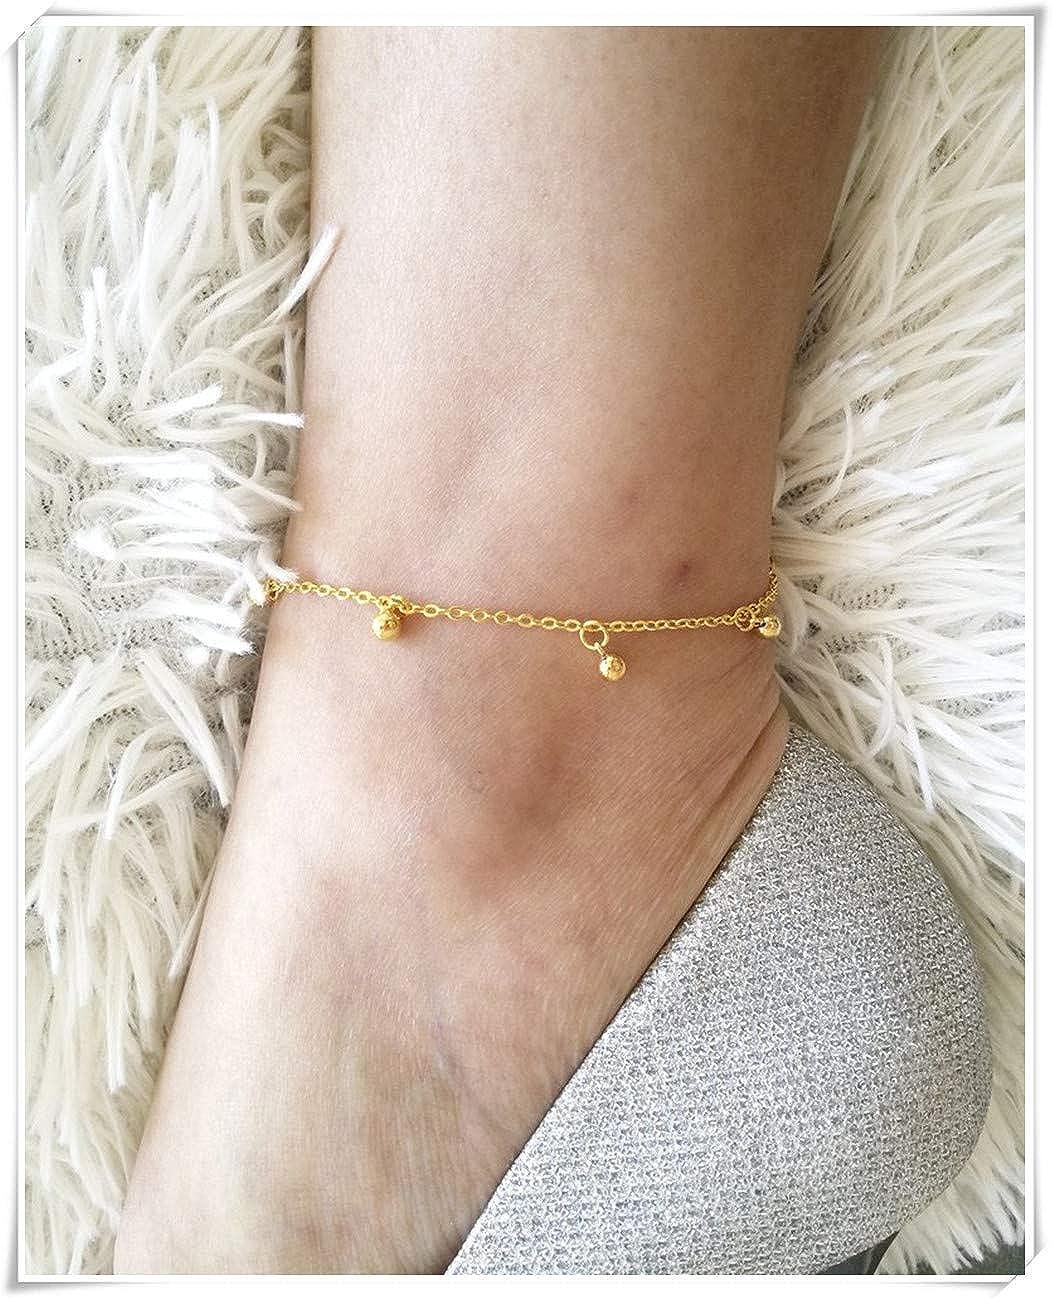 Delicate Ball Anklet Minimal Charm Anklet Gold Beaded Anklet.Fine Jewelry Gold Ball Anklet Ball Anklet Pure Handmade.